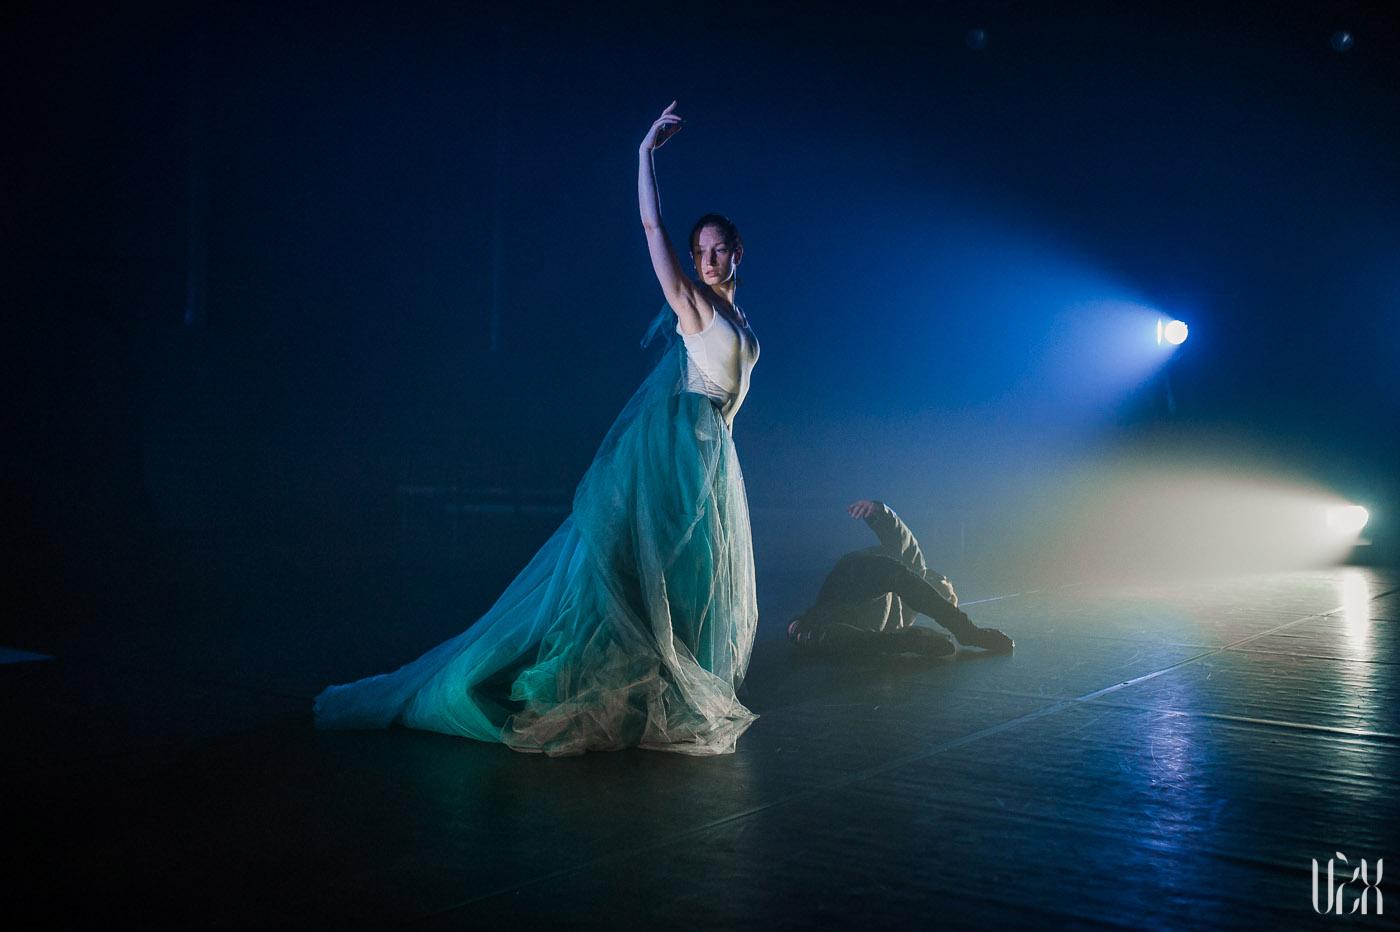 E.sabaliauskaite Vzx.lt Faustas Teatras Event 009